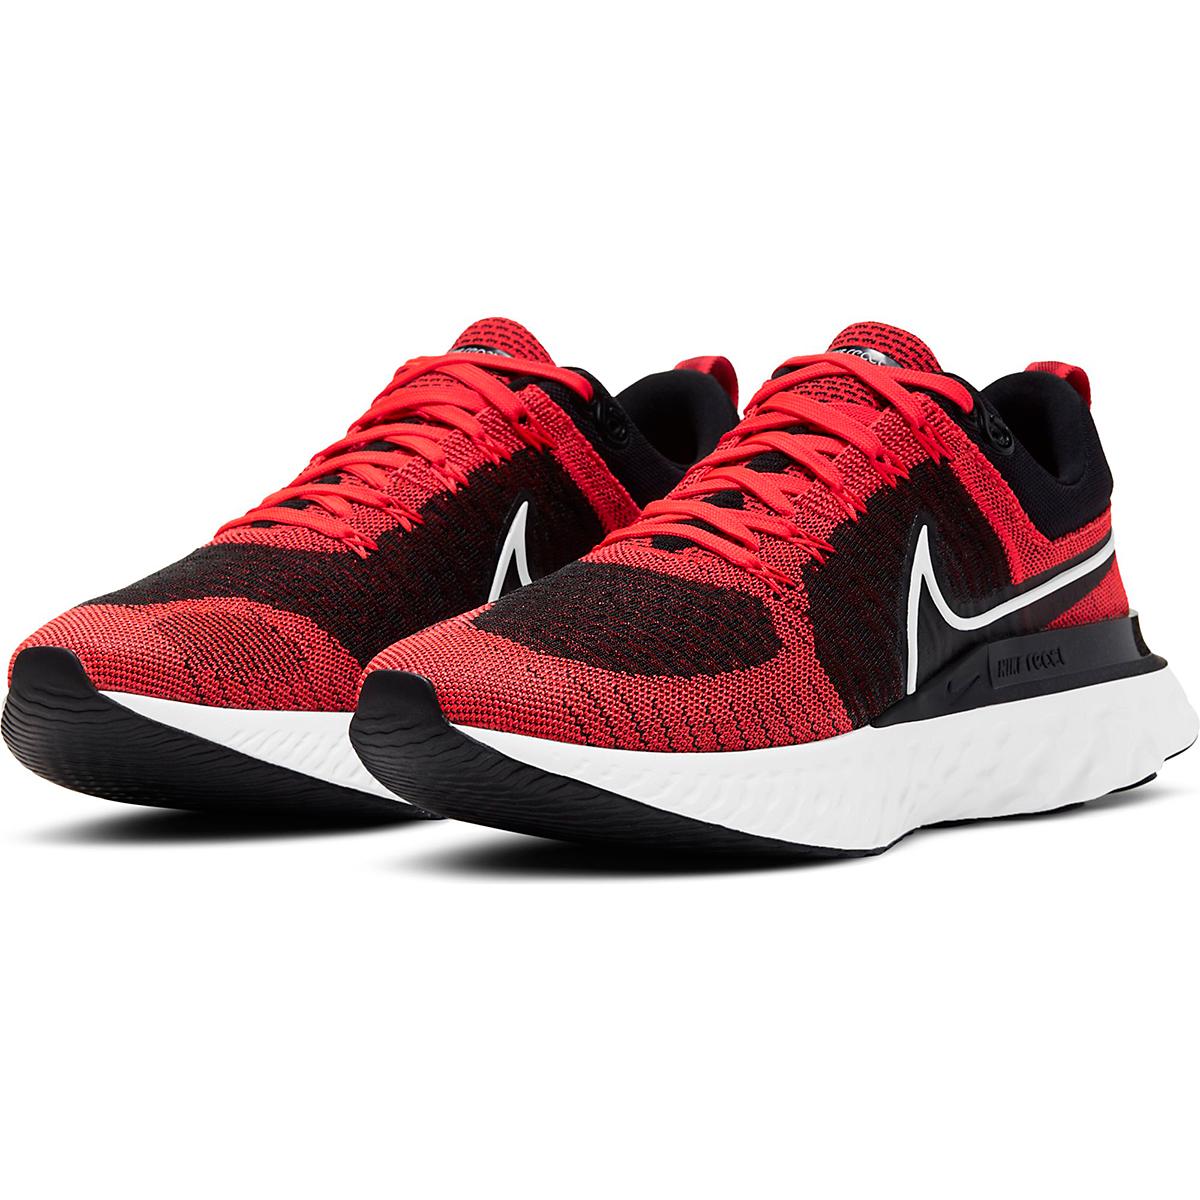 Men's Nike React Infinity Run Flyknit 2 Running Shoe - Color: Bright Crimson/White/Black/Smike Grey - Size: 6 - Width: Regular, Bright Crimson/White/Black/Smike Grey, large, image 3